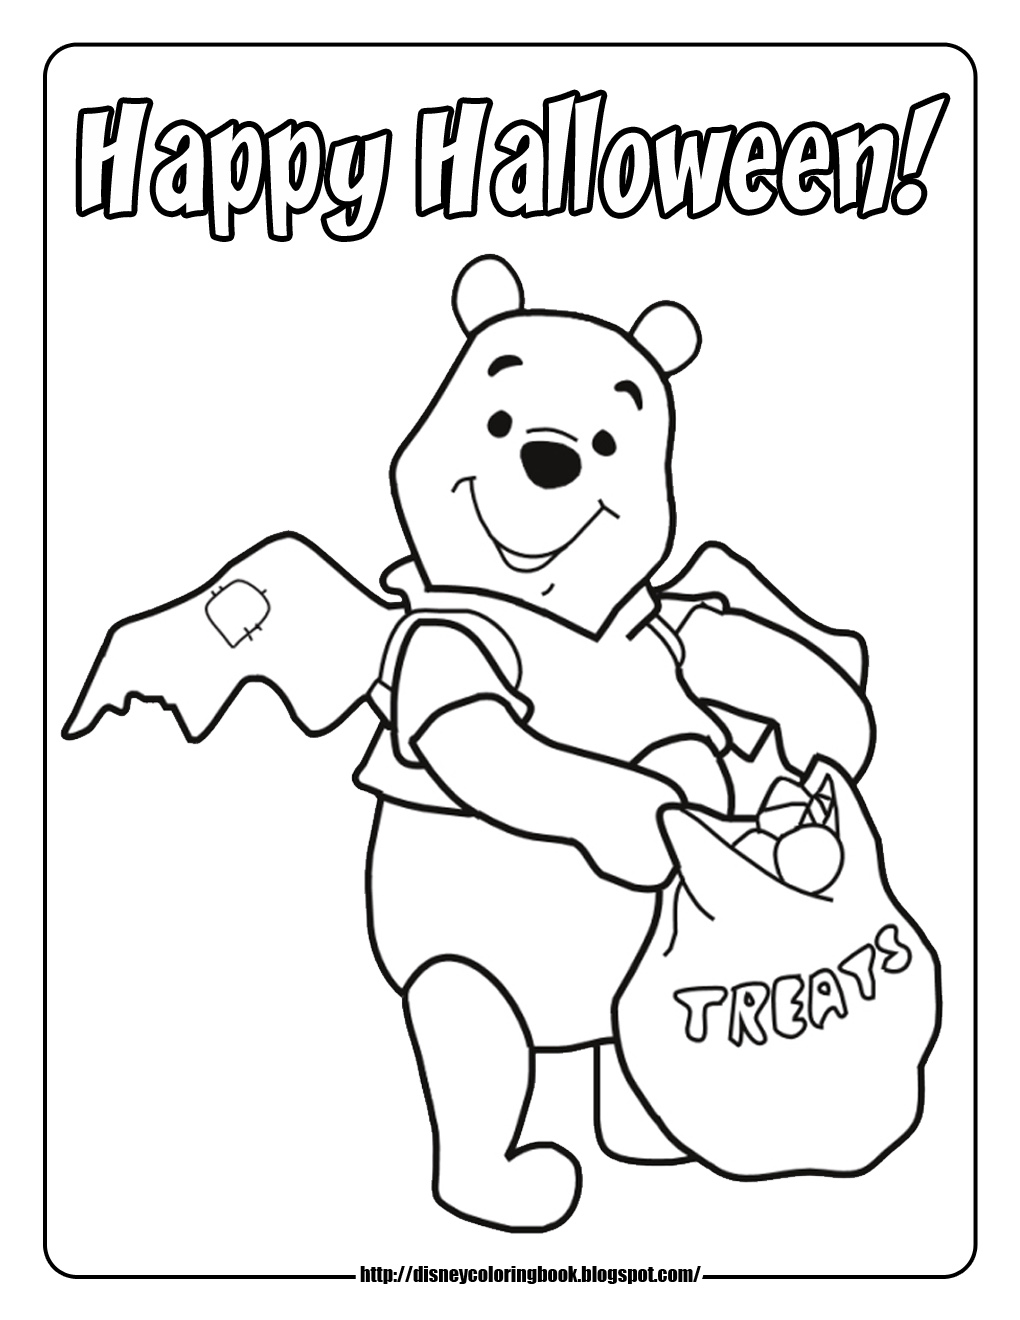 Pooh and Friends Halloween 2: Free Disney Halloween